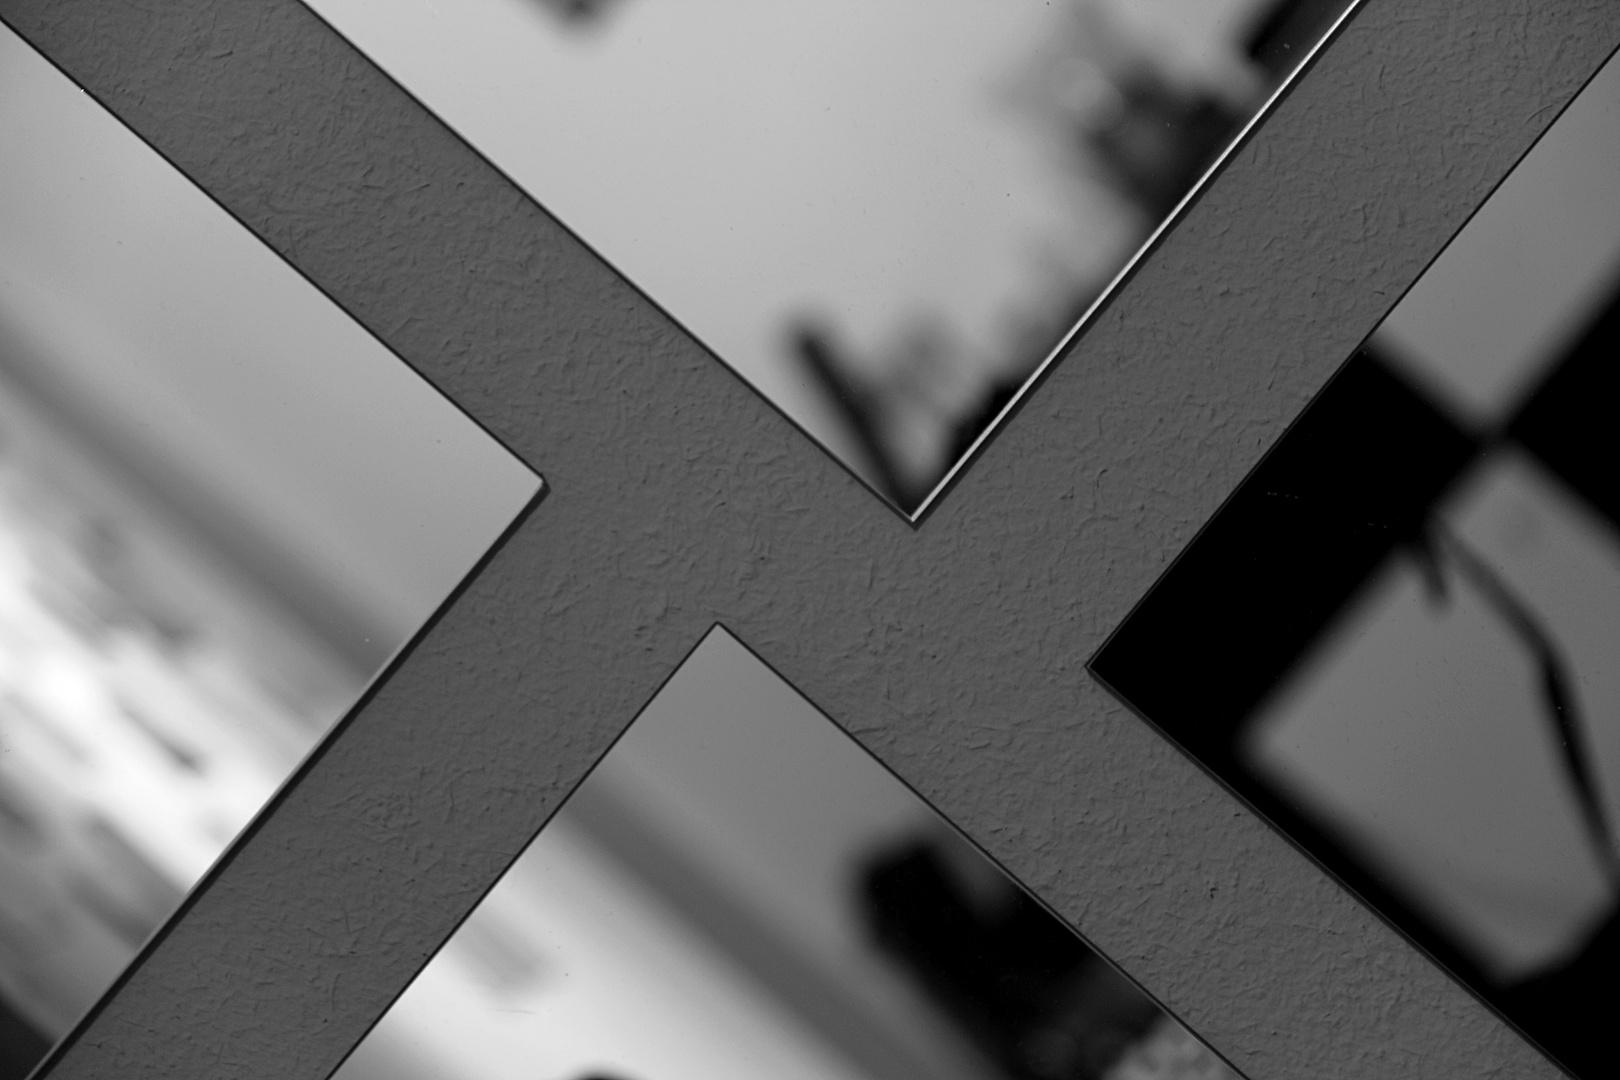 Mirror Edges